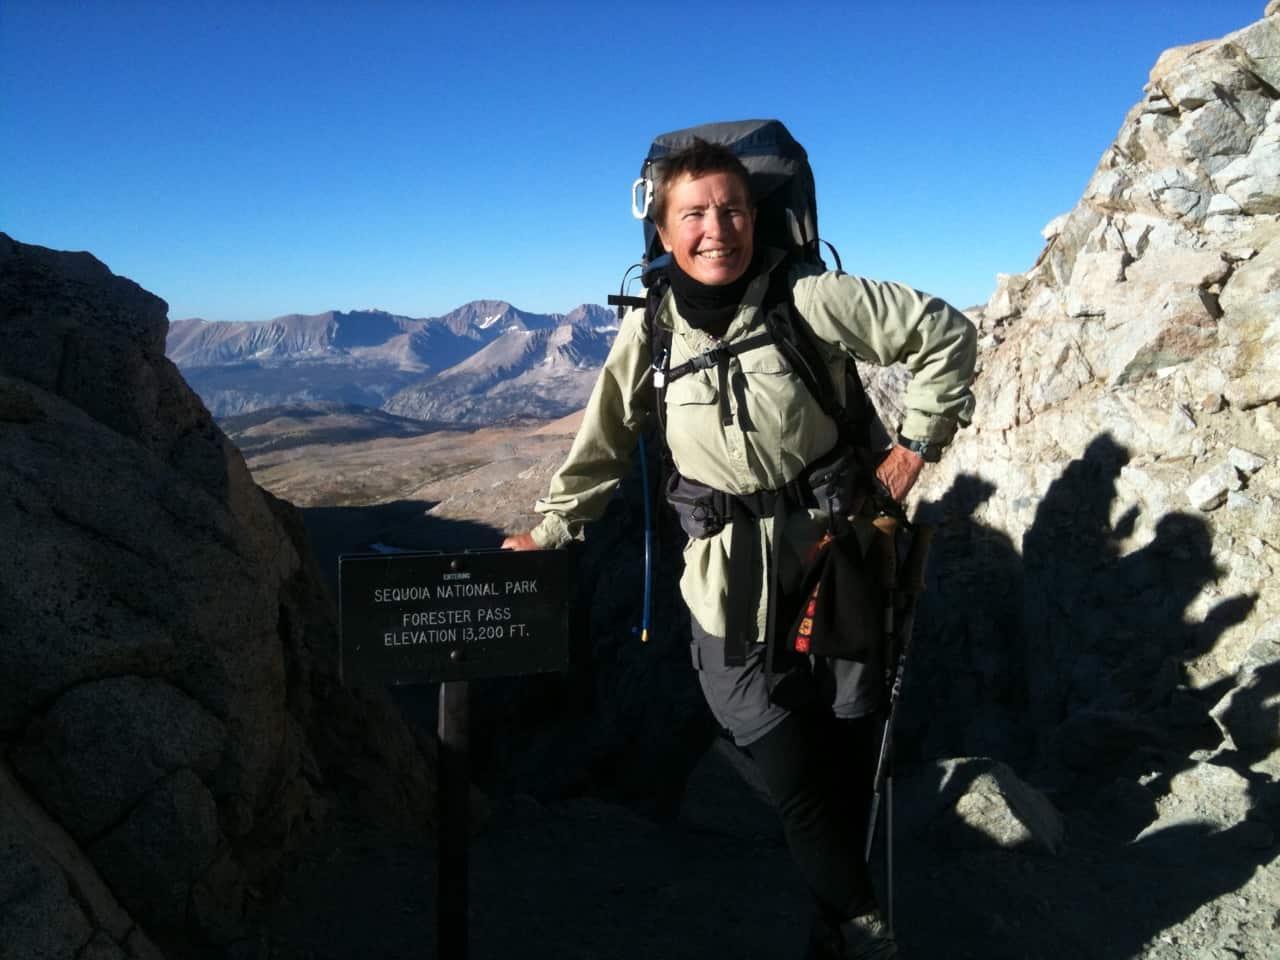 Pacific Crest Trail through-hiker Janet Zalewski, executive director of the Siskiyou Land Trust. (Courtesy of the Siskiyou Land Trust)